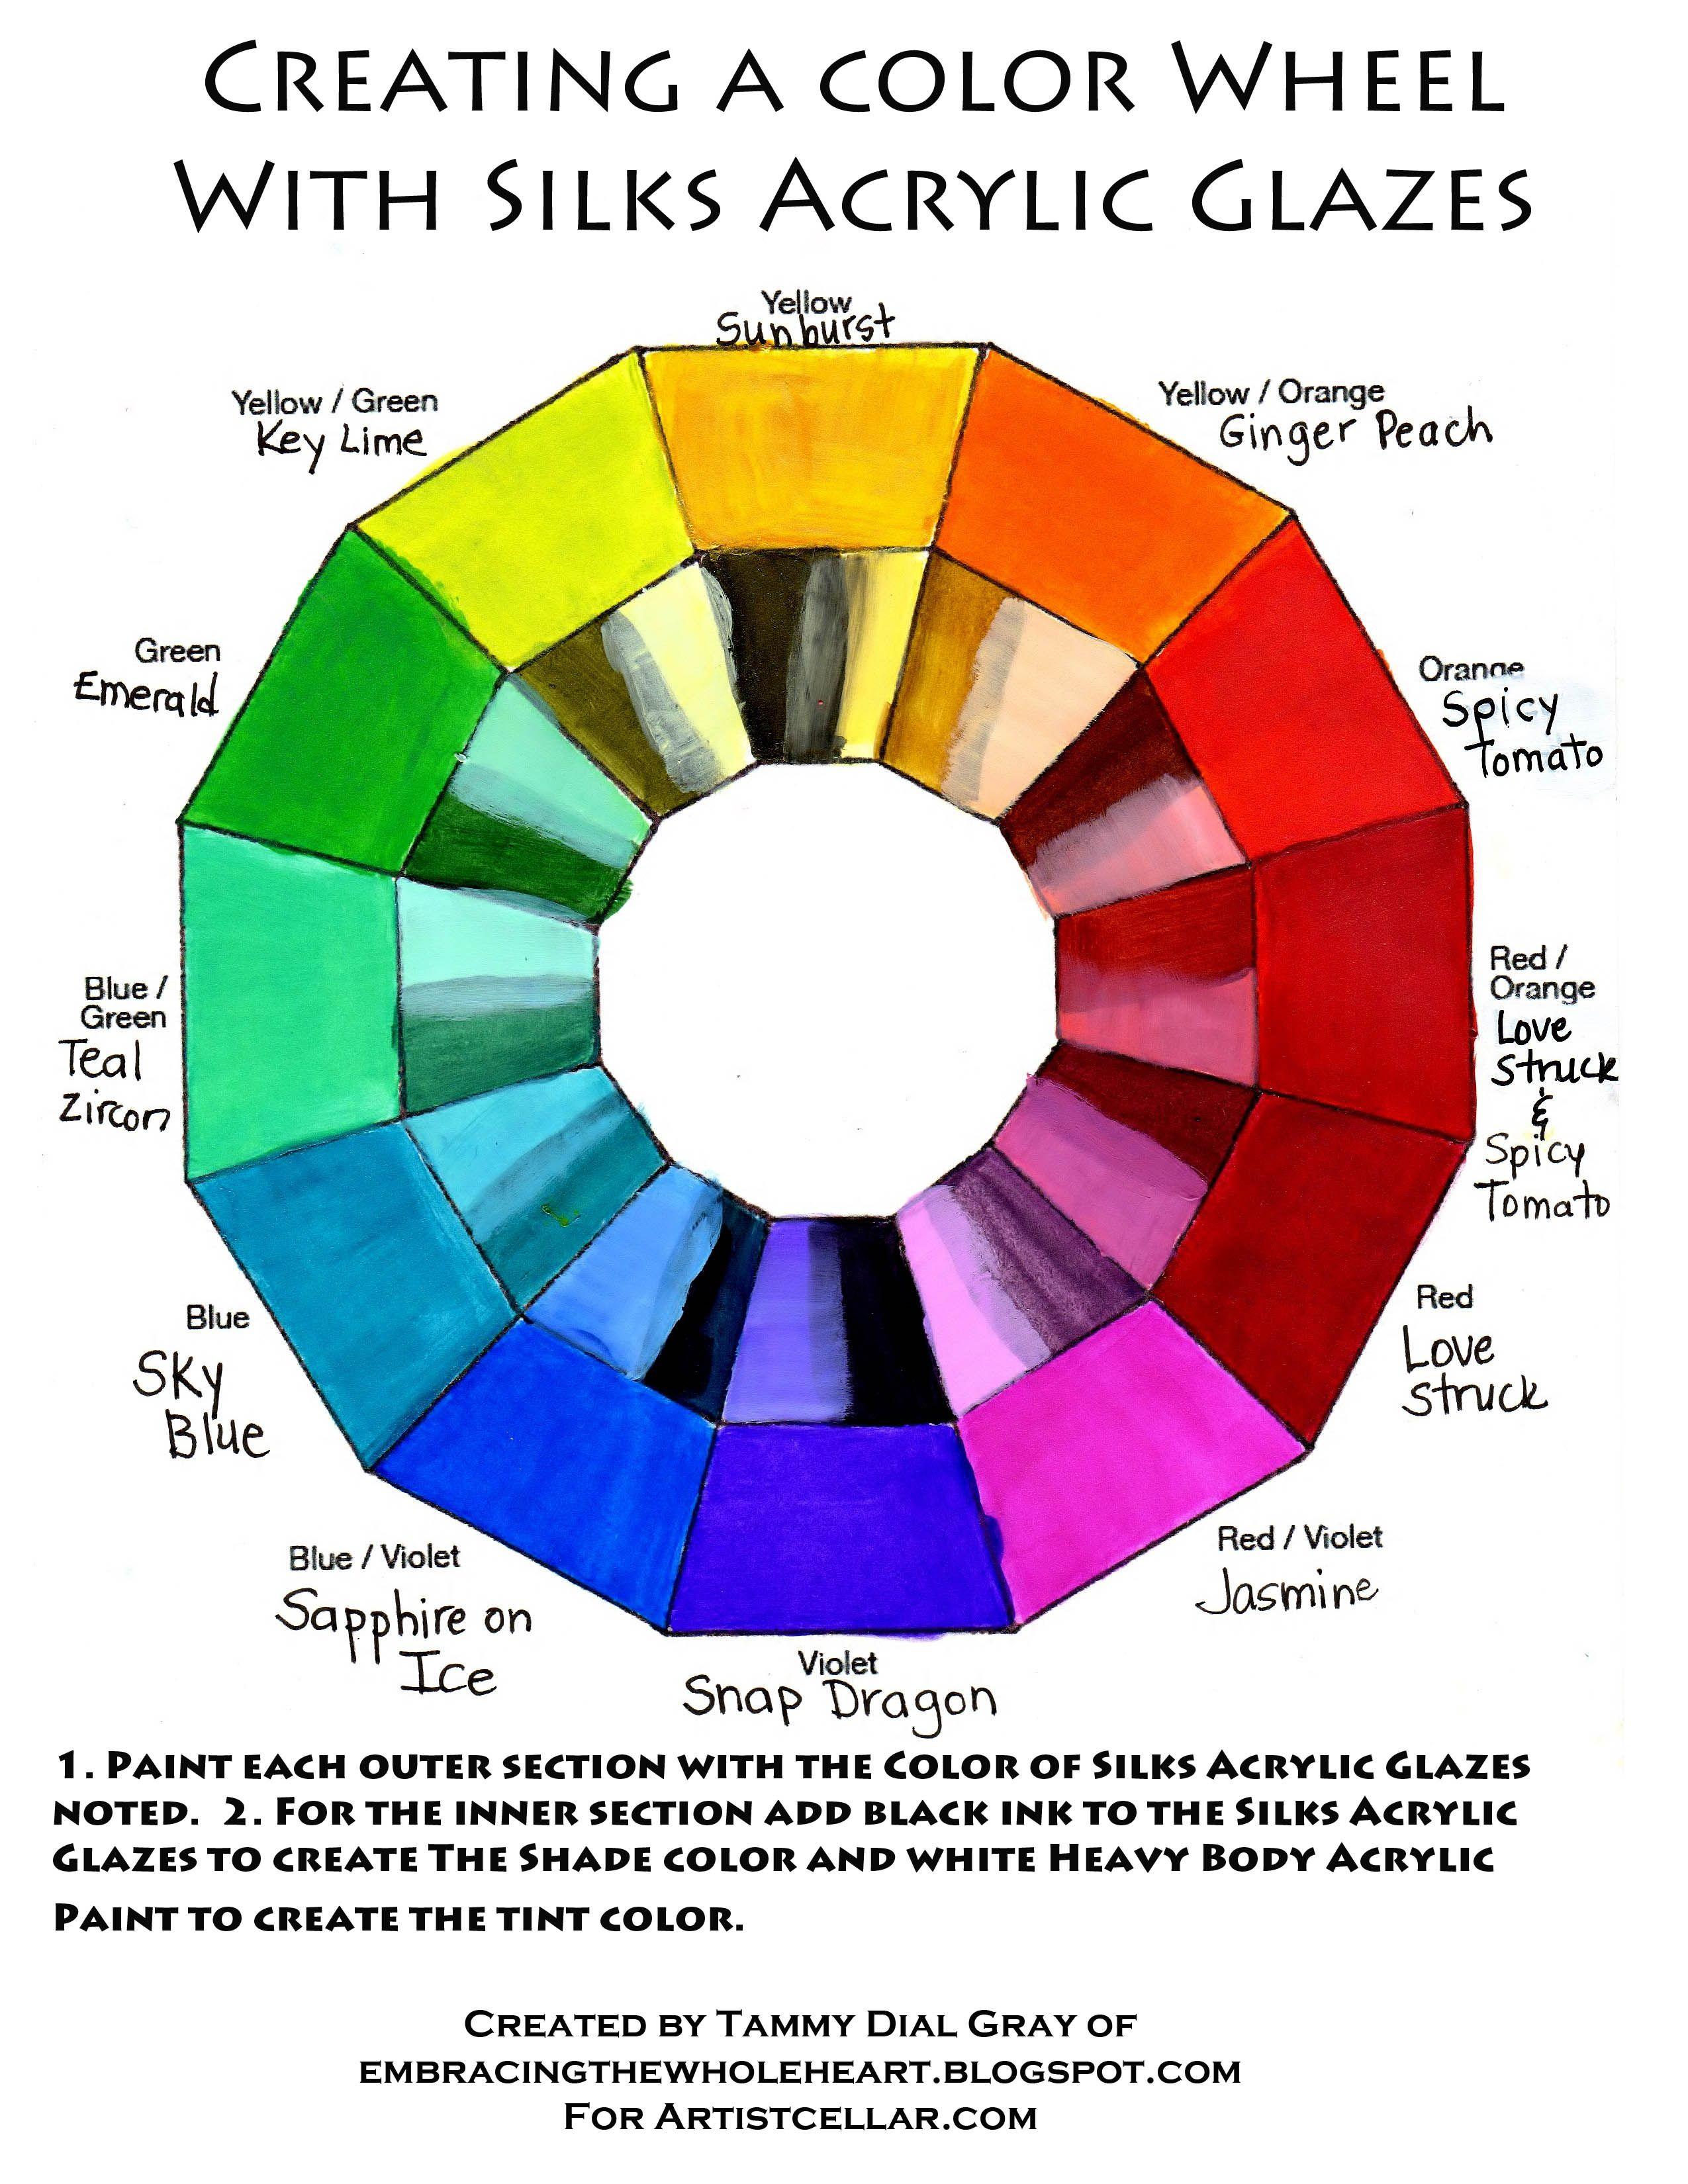 Creating a color wheel with silks acrylic glazes by tammy